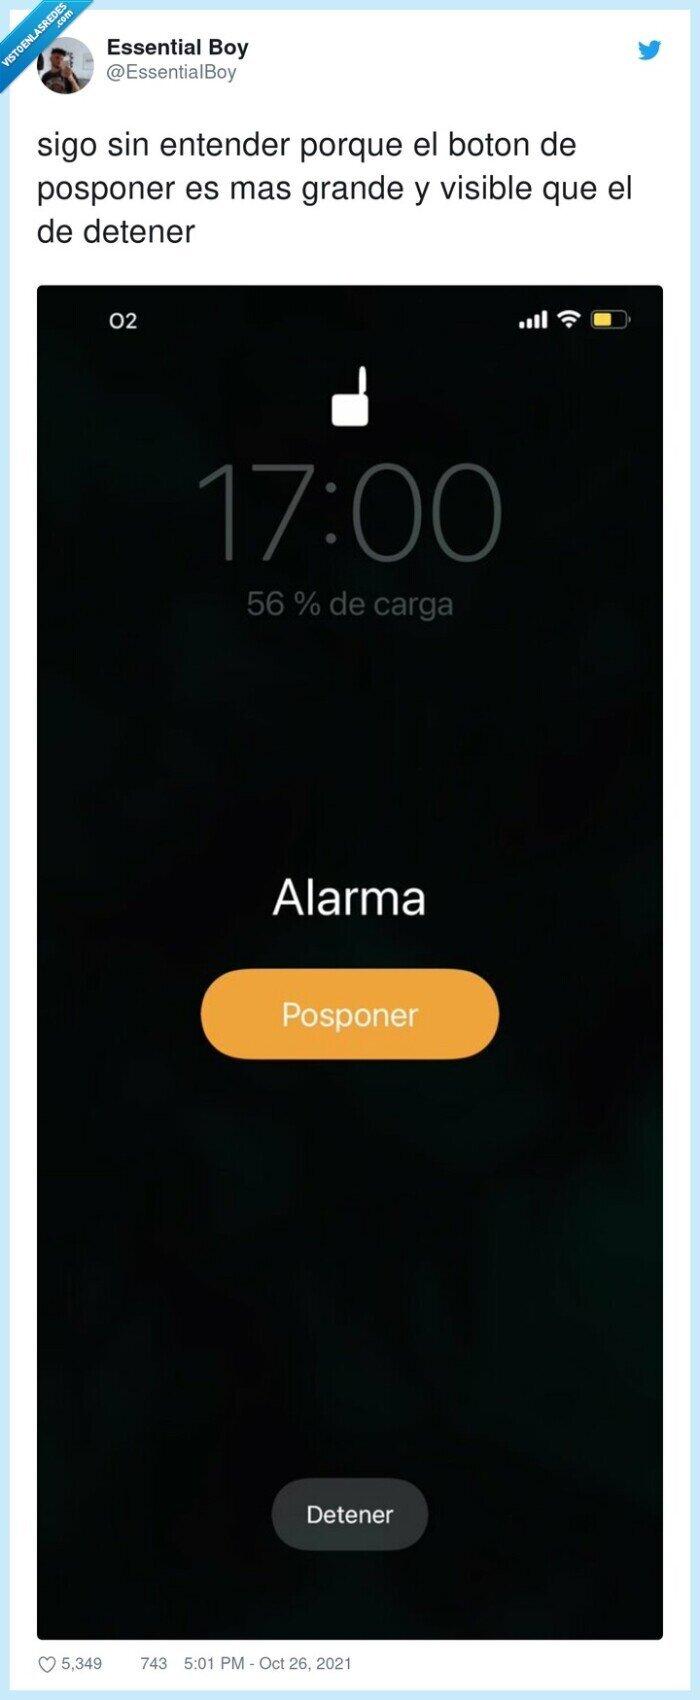 botón,detener,entender,grande,iphone,posponer,tamaño,visible